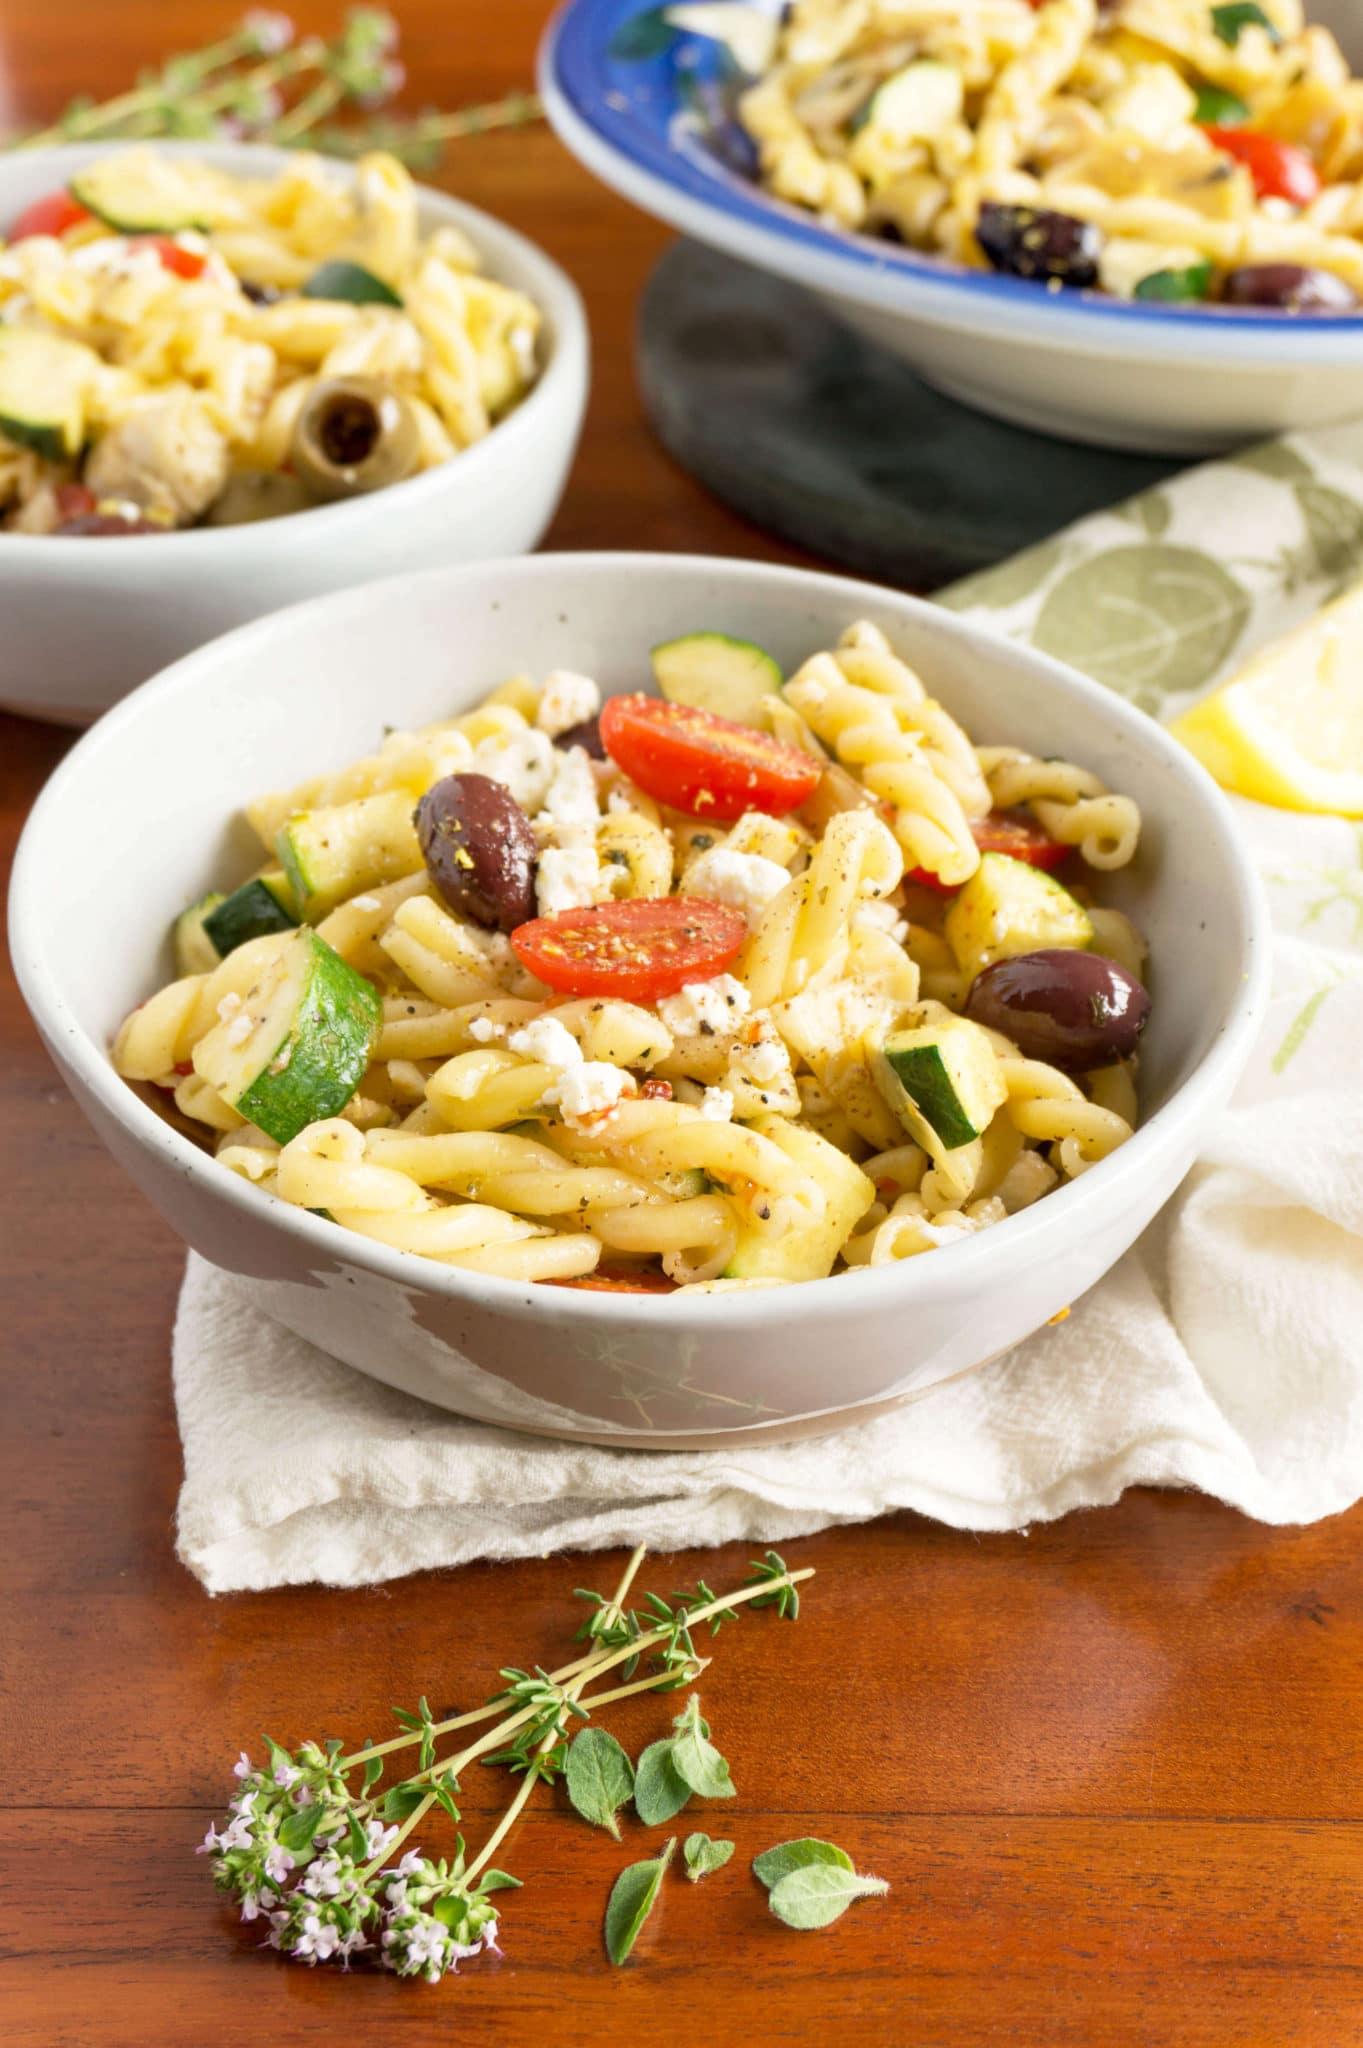 Lemon, Garlic + Herbs dress this one-pot Greek Pasta Salad with creamy French feta cheese, olives, artichokes and zucchini! | PASTA | ZUCCHINI | VEGETARIAN | GREEK | Recipe at OatandSesame.com